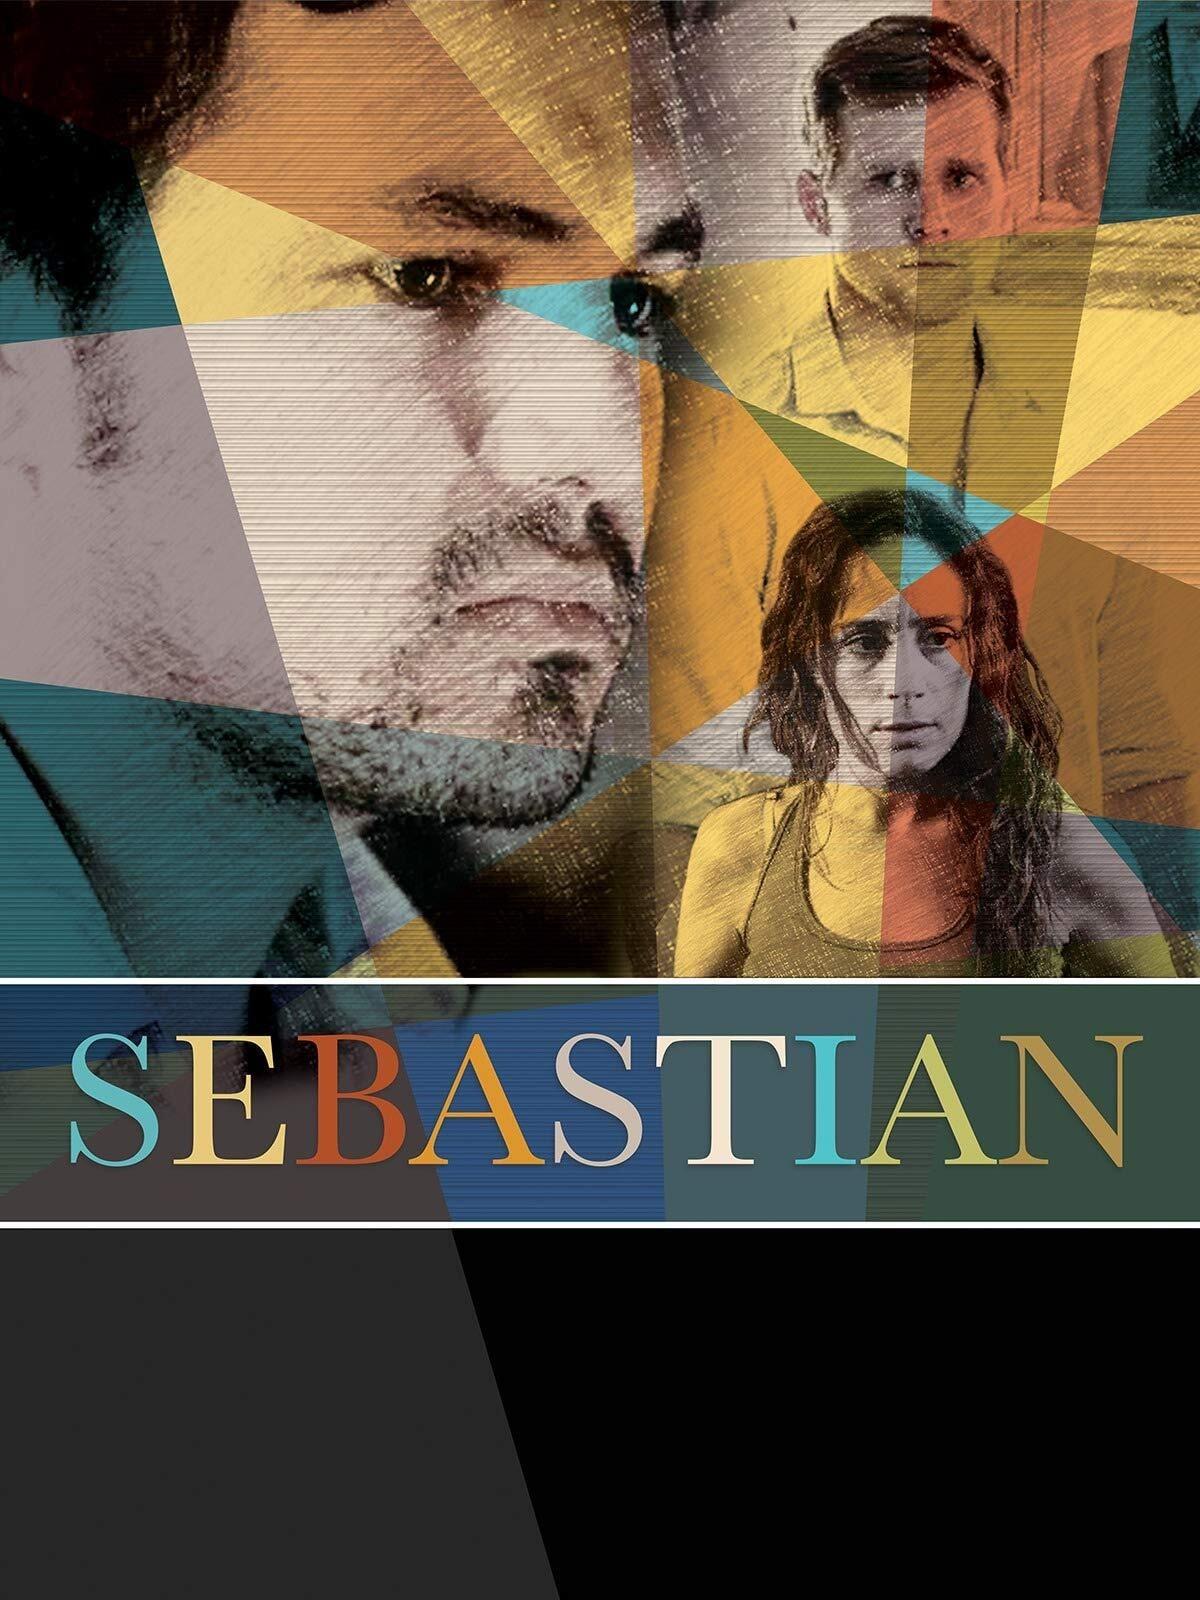 Sebastian on FREECABLE TV